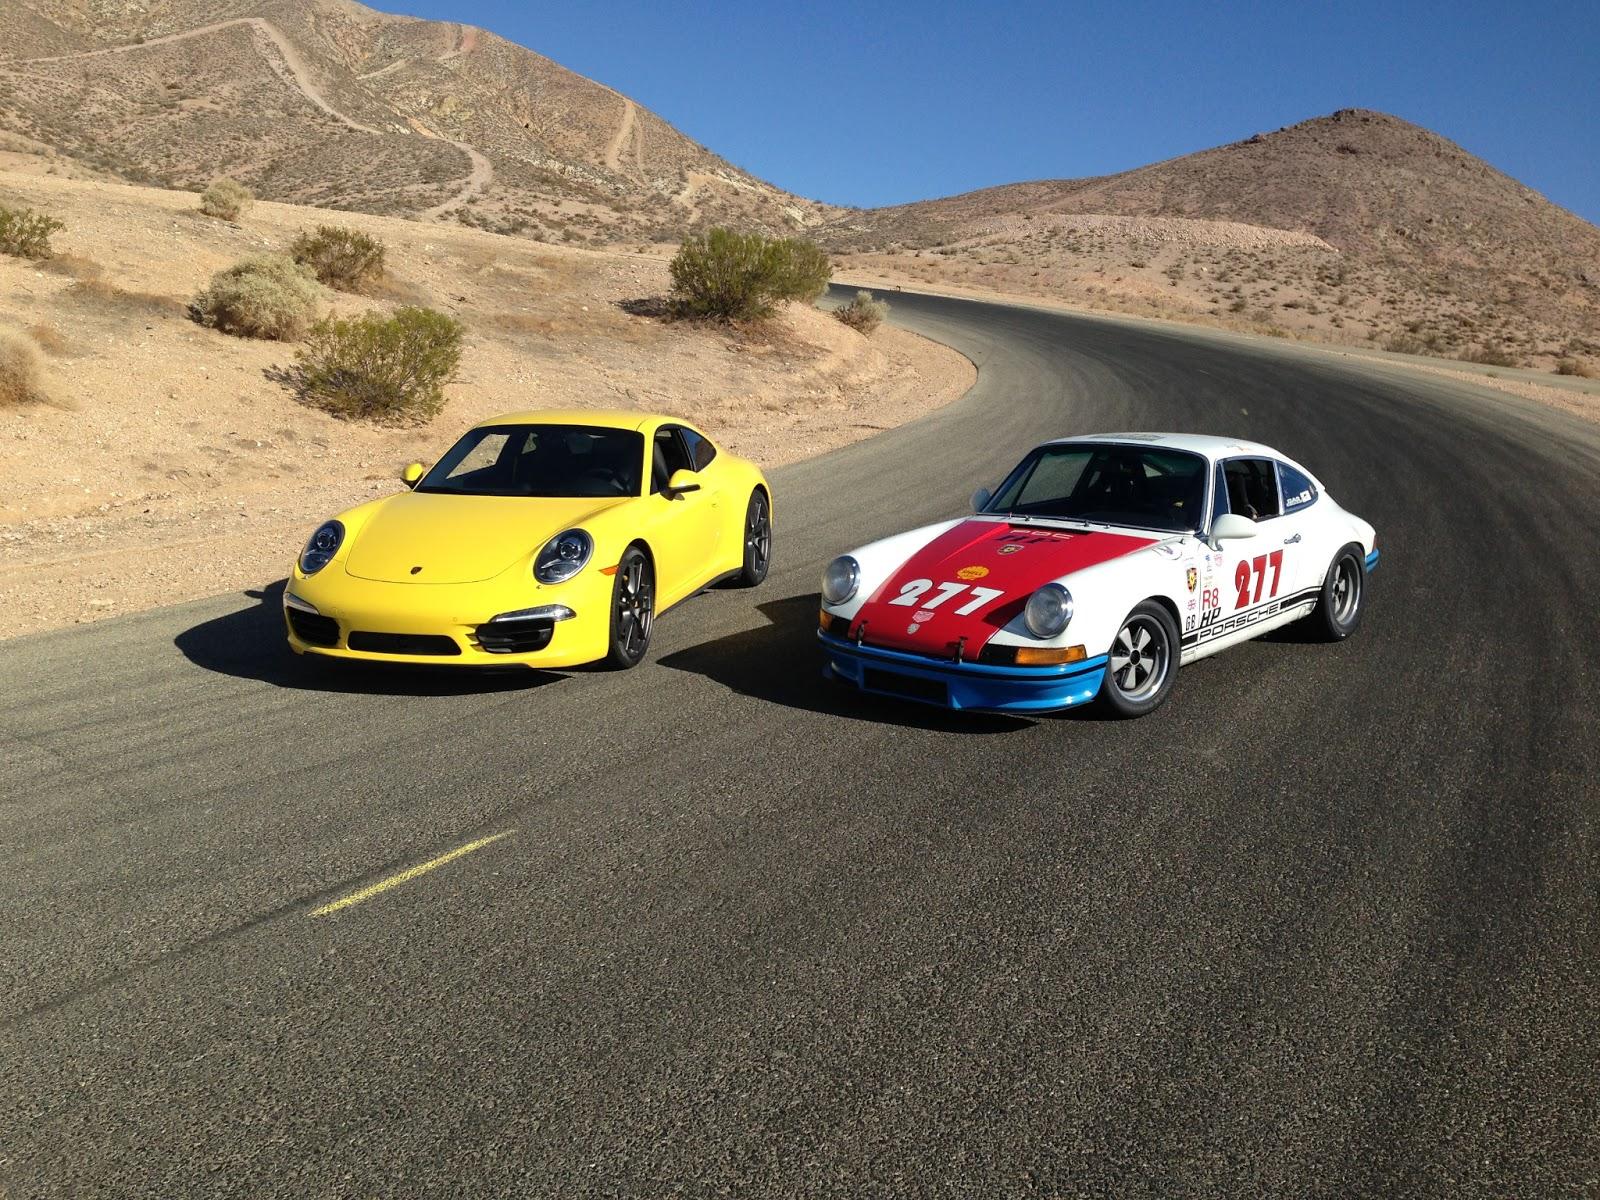 MagnusWalker JUSTIN BELL WORLDS FASTEST CAR SHOW - Show me the fastest car